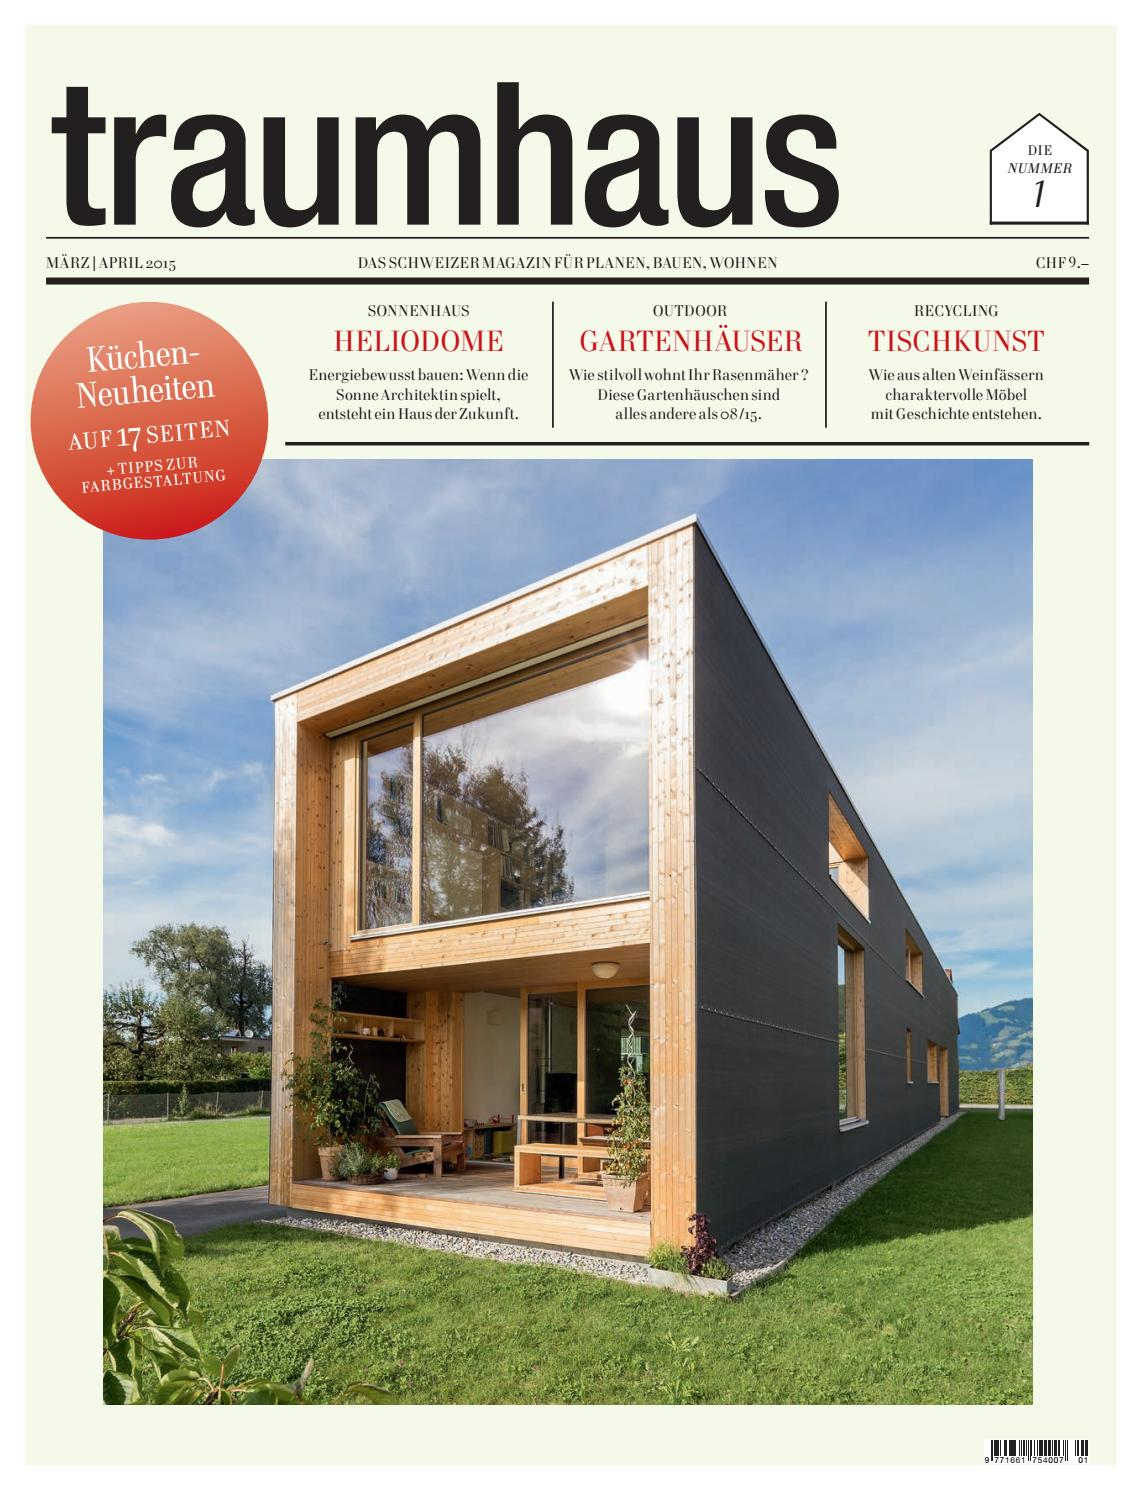 Traumhaus 01 2015 By BL Verlag AG   Issuu